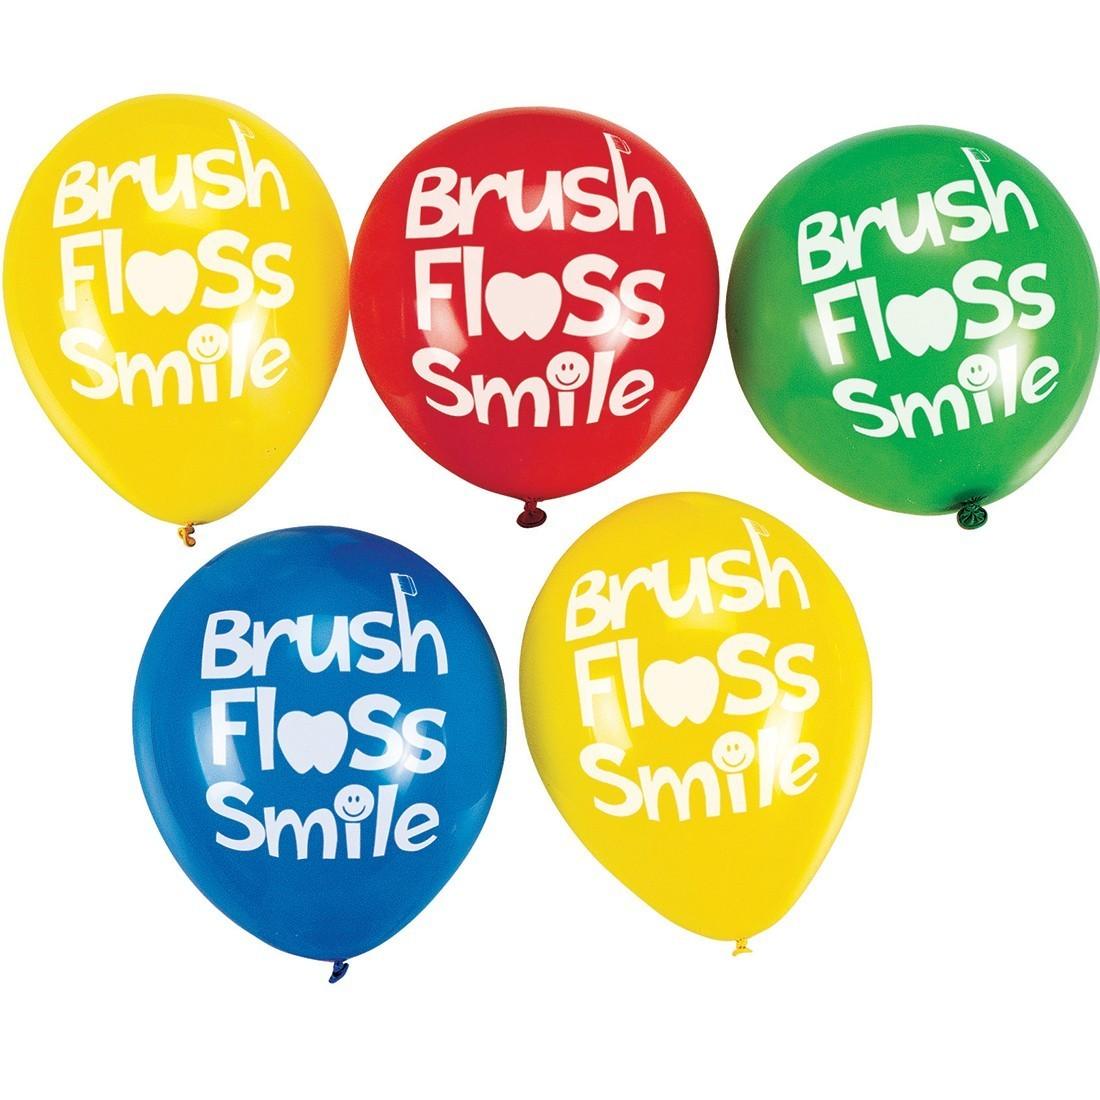 Brush, Floss, Smile Latex Balloons [image]